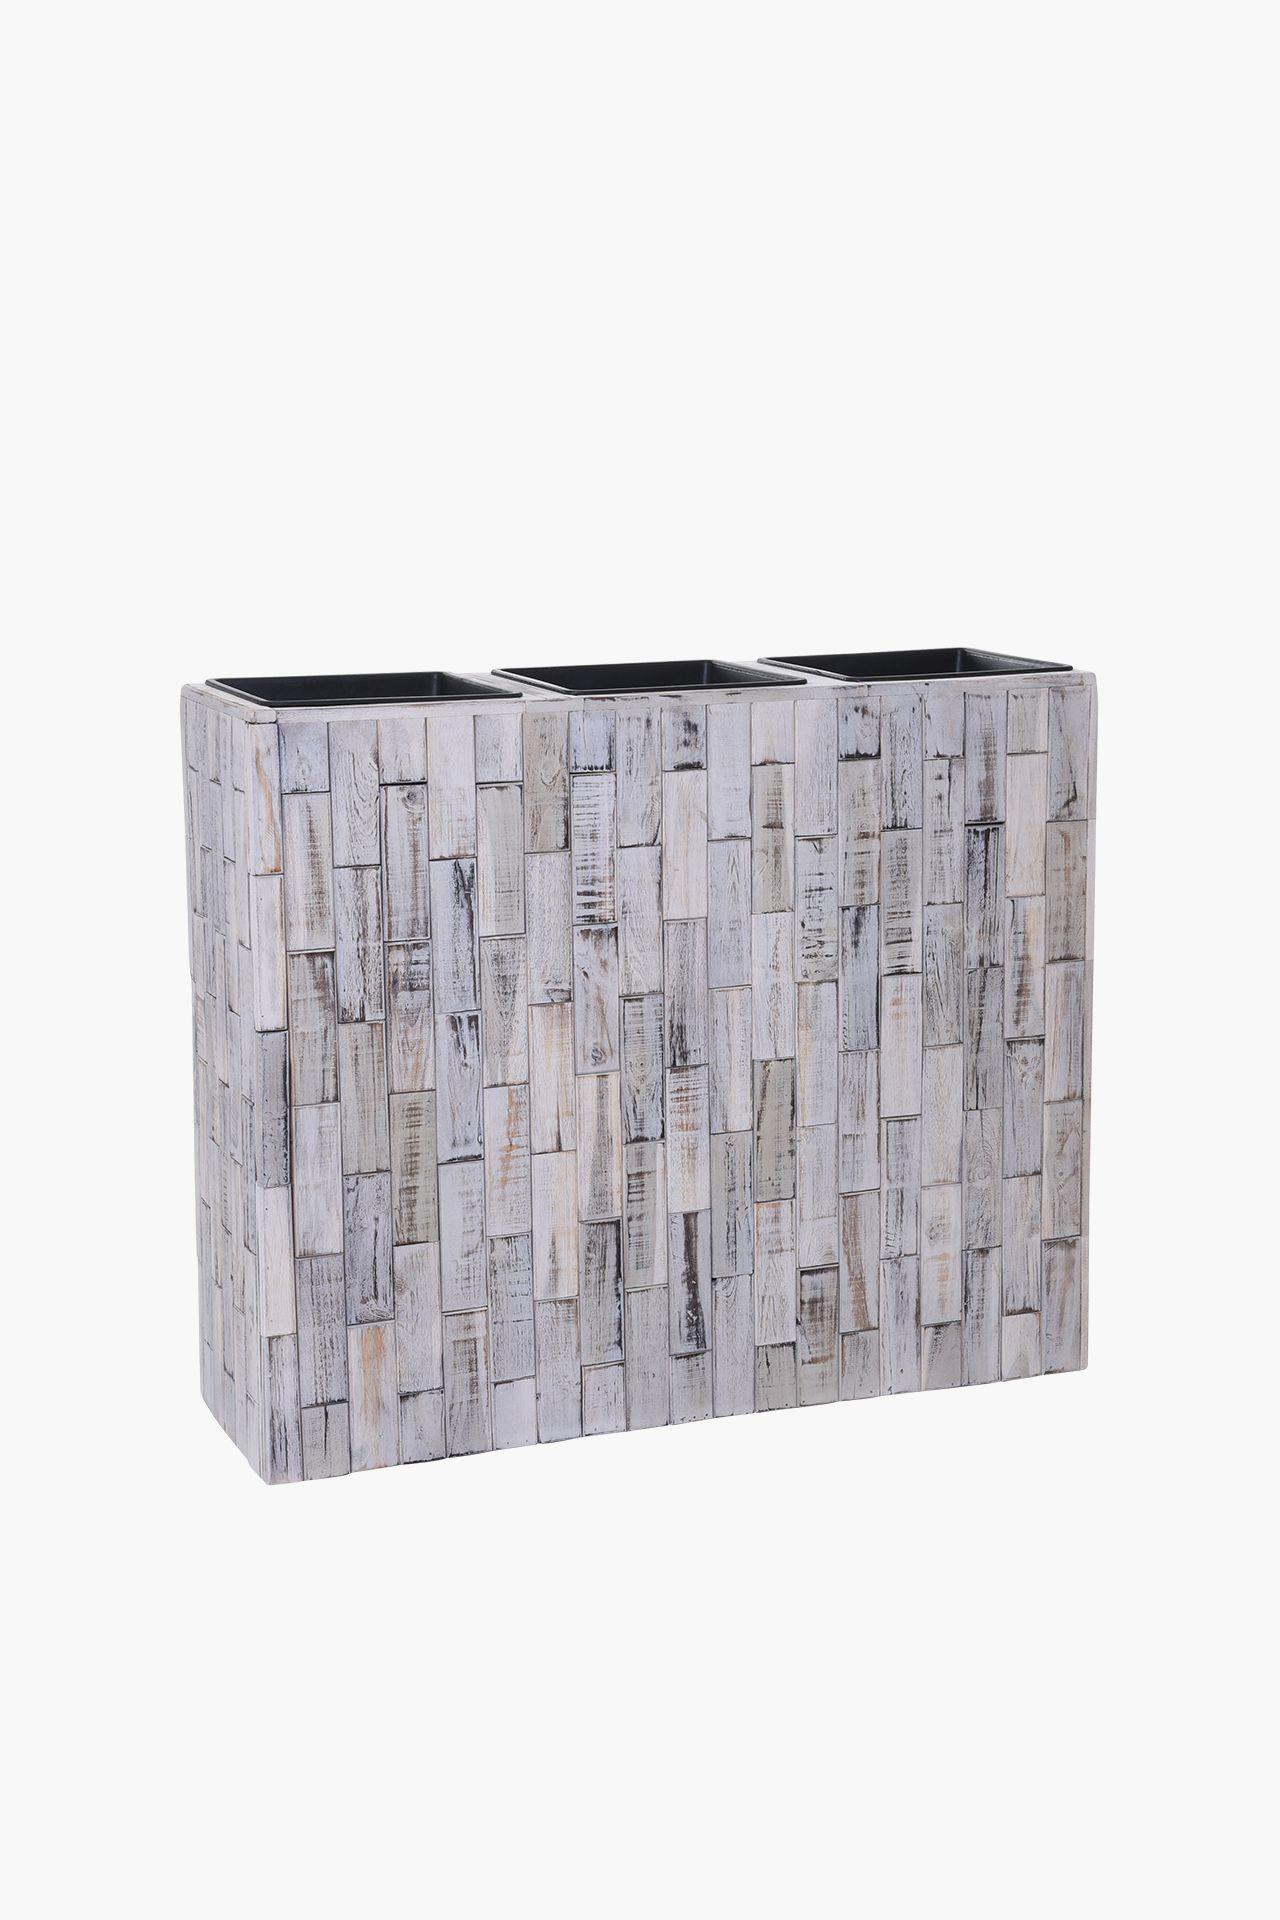 pflanzk bel raumteiler recycling holz elemento shabby chic wei 90 cm breit ebay. Black Bedroom Furniture Sets. Home Design Ideas